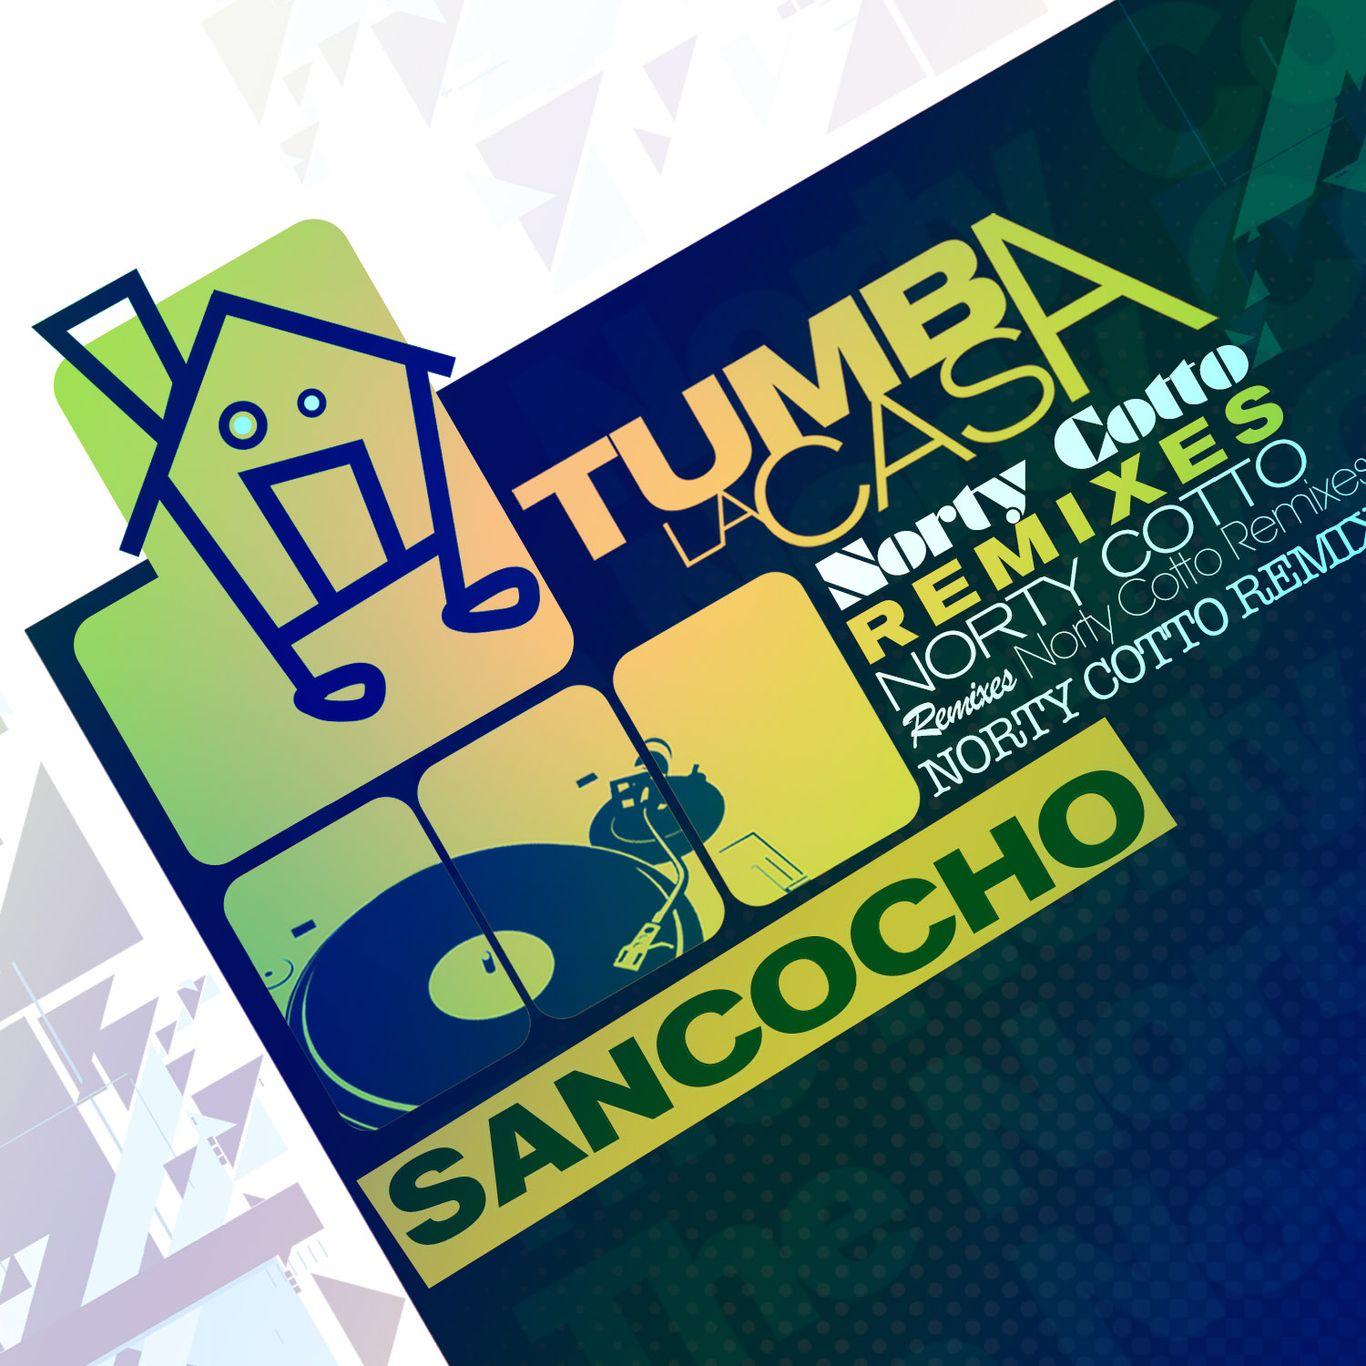 TUMBA LA CASA (Tearing Down The House) - Tumba La Acapella